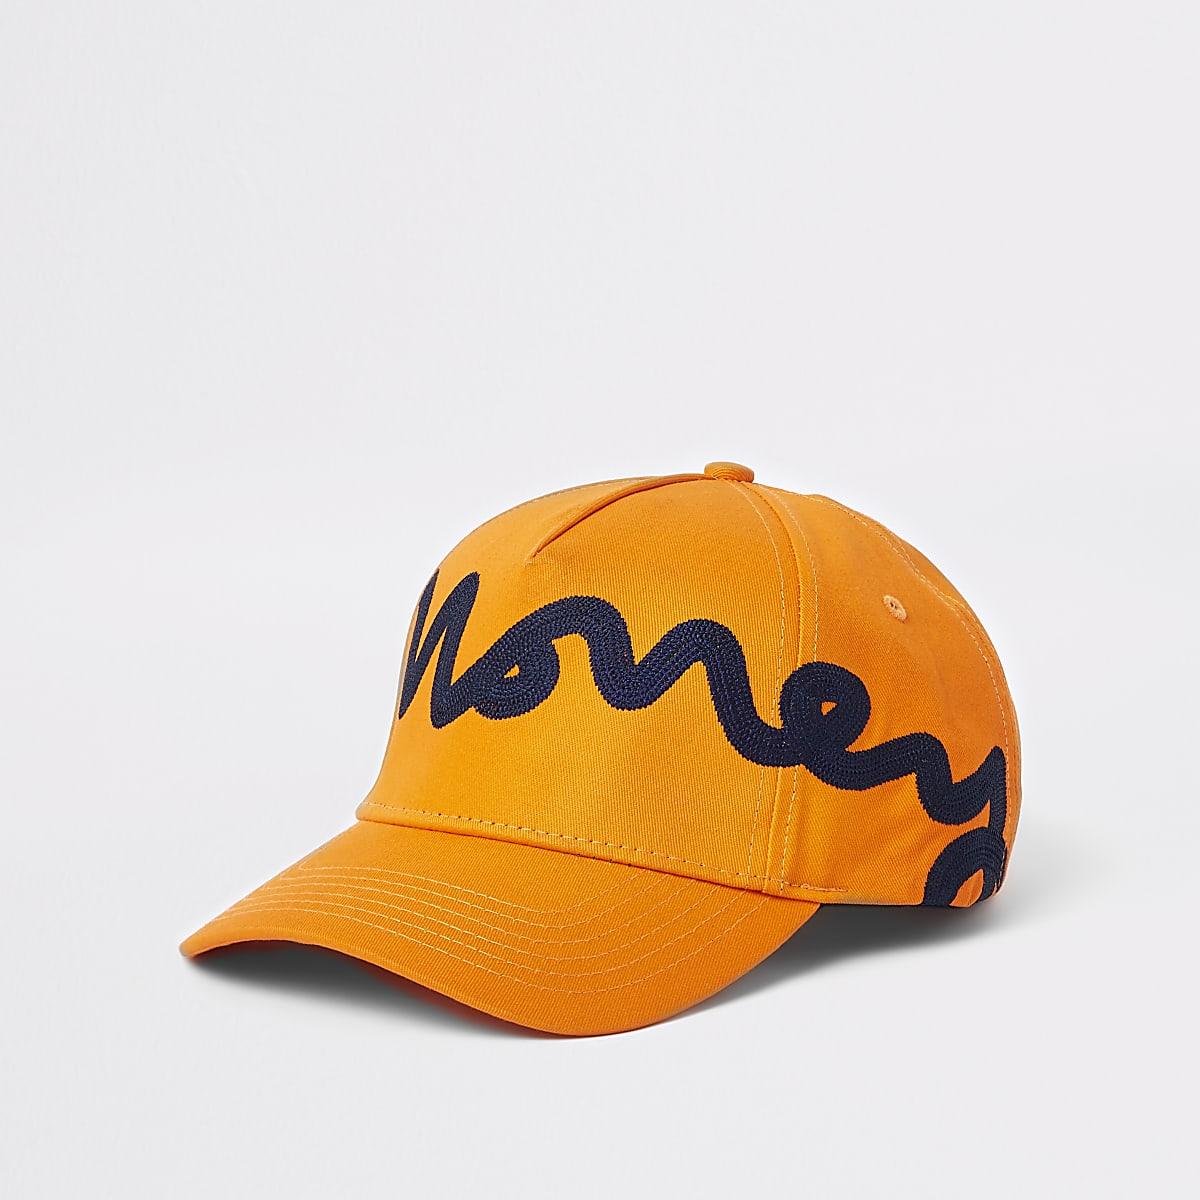 Money Clothing – Casquette de baseball orange